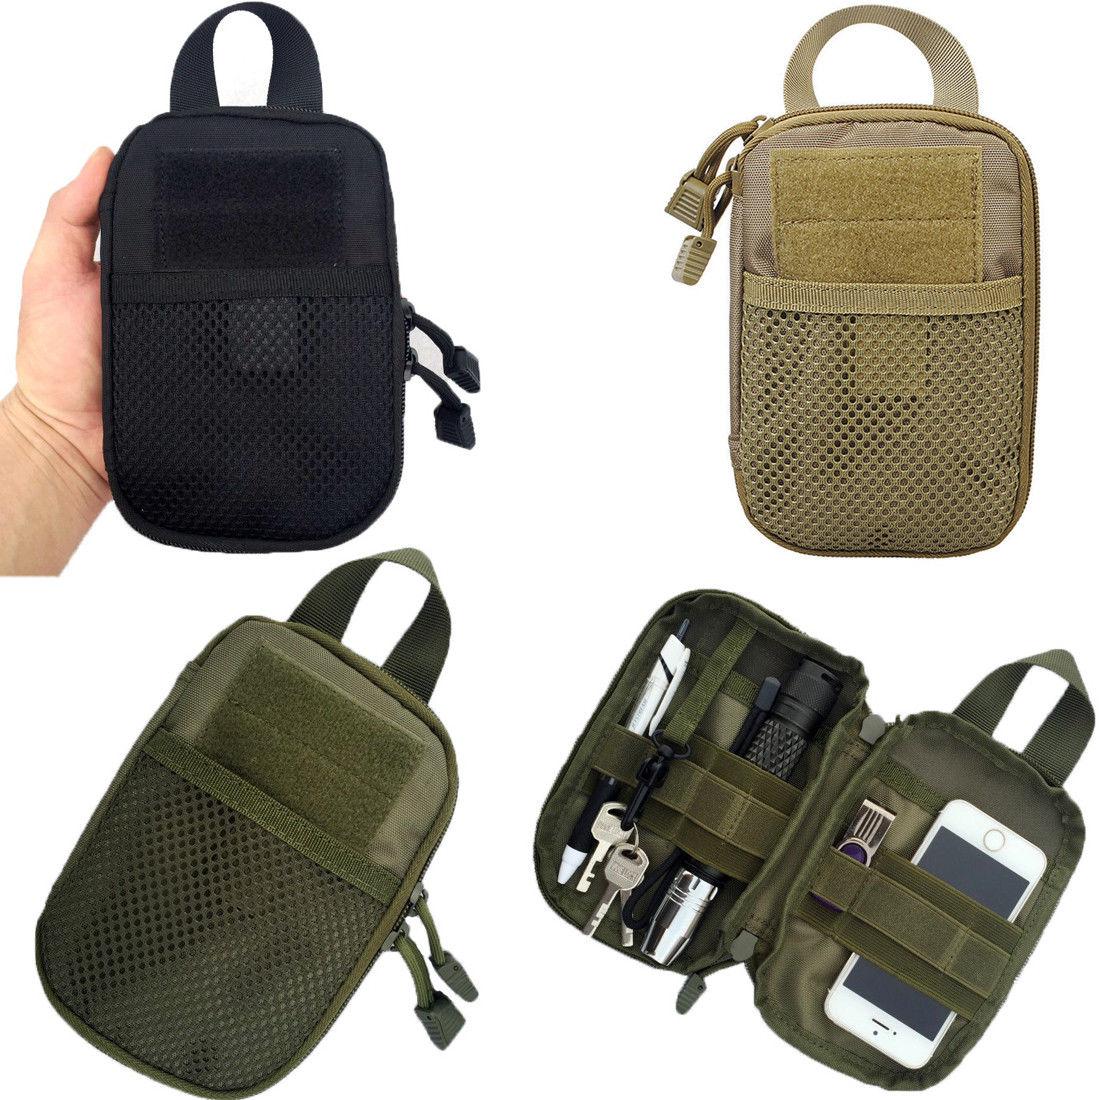 Portable Unisex Outdoor Waterproof Tactical Waist Belt Pack Phone Case Pouch Bag